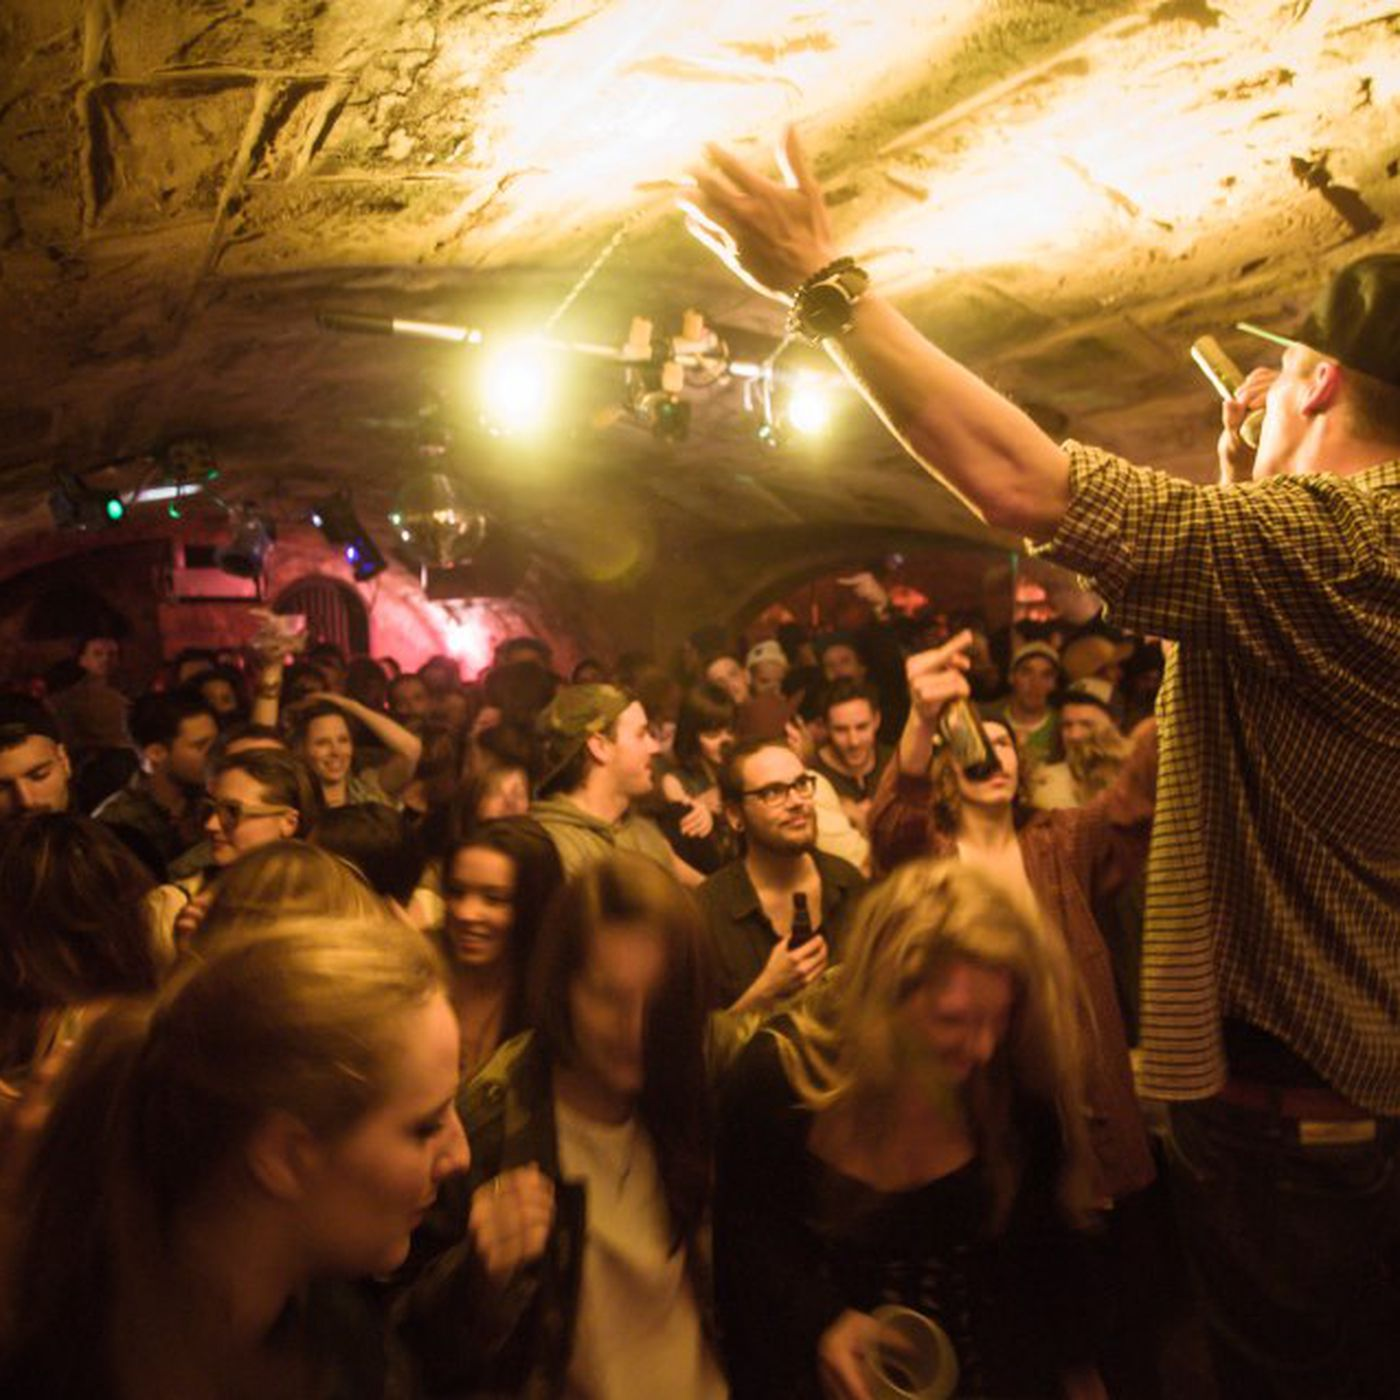 Montreal Bars Makeover Includes Unprecedented Smartphone Ban